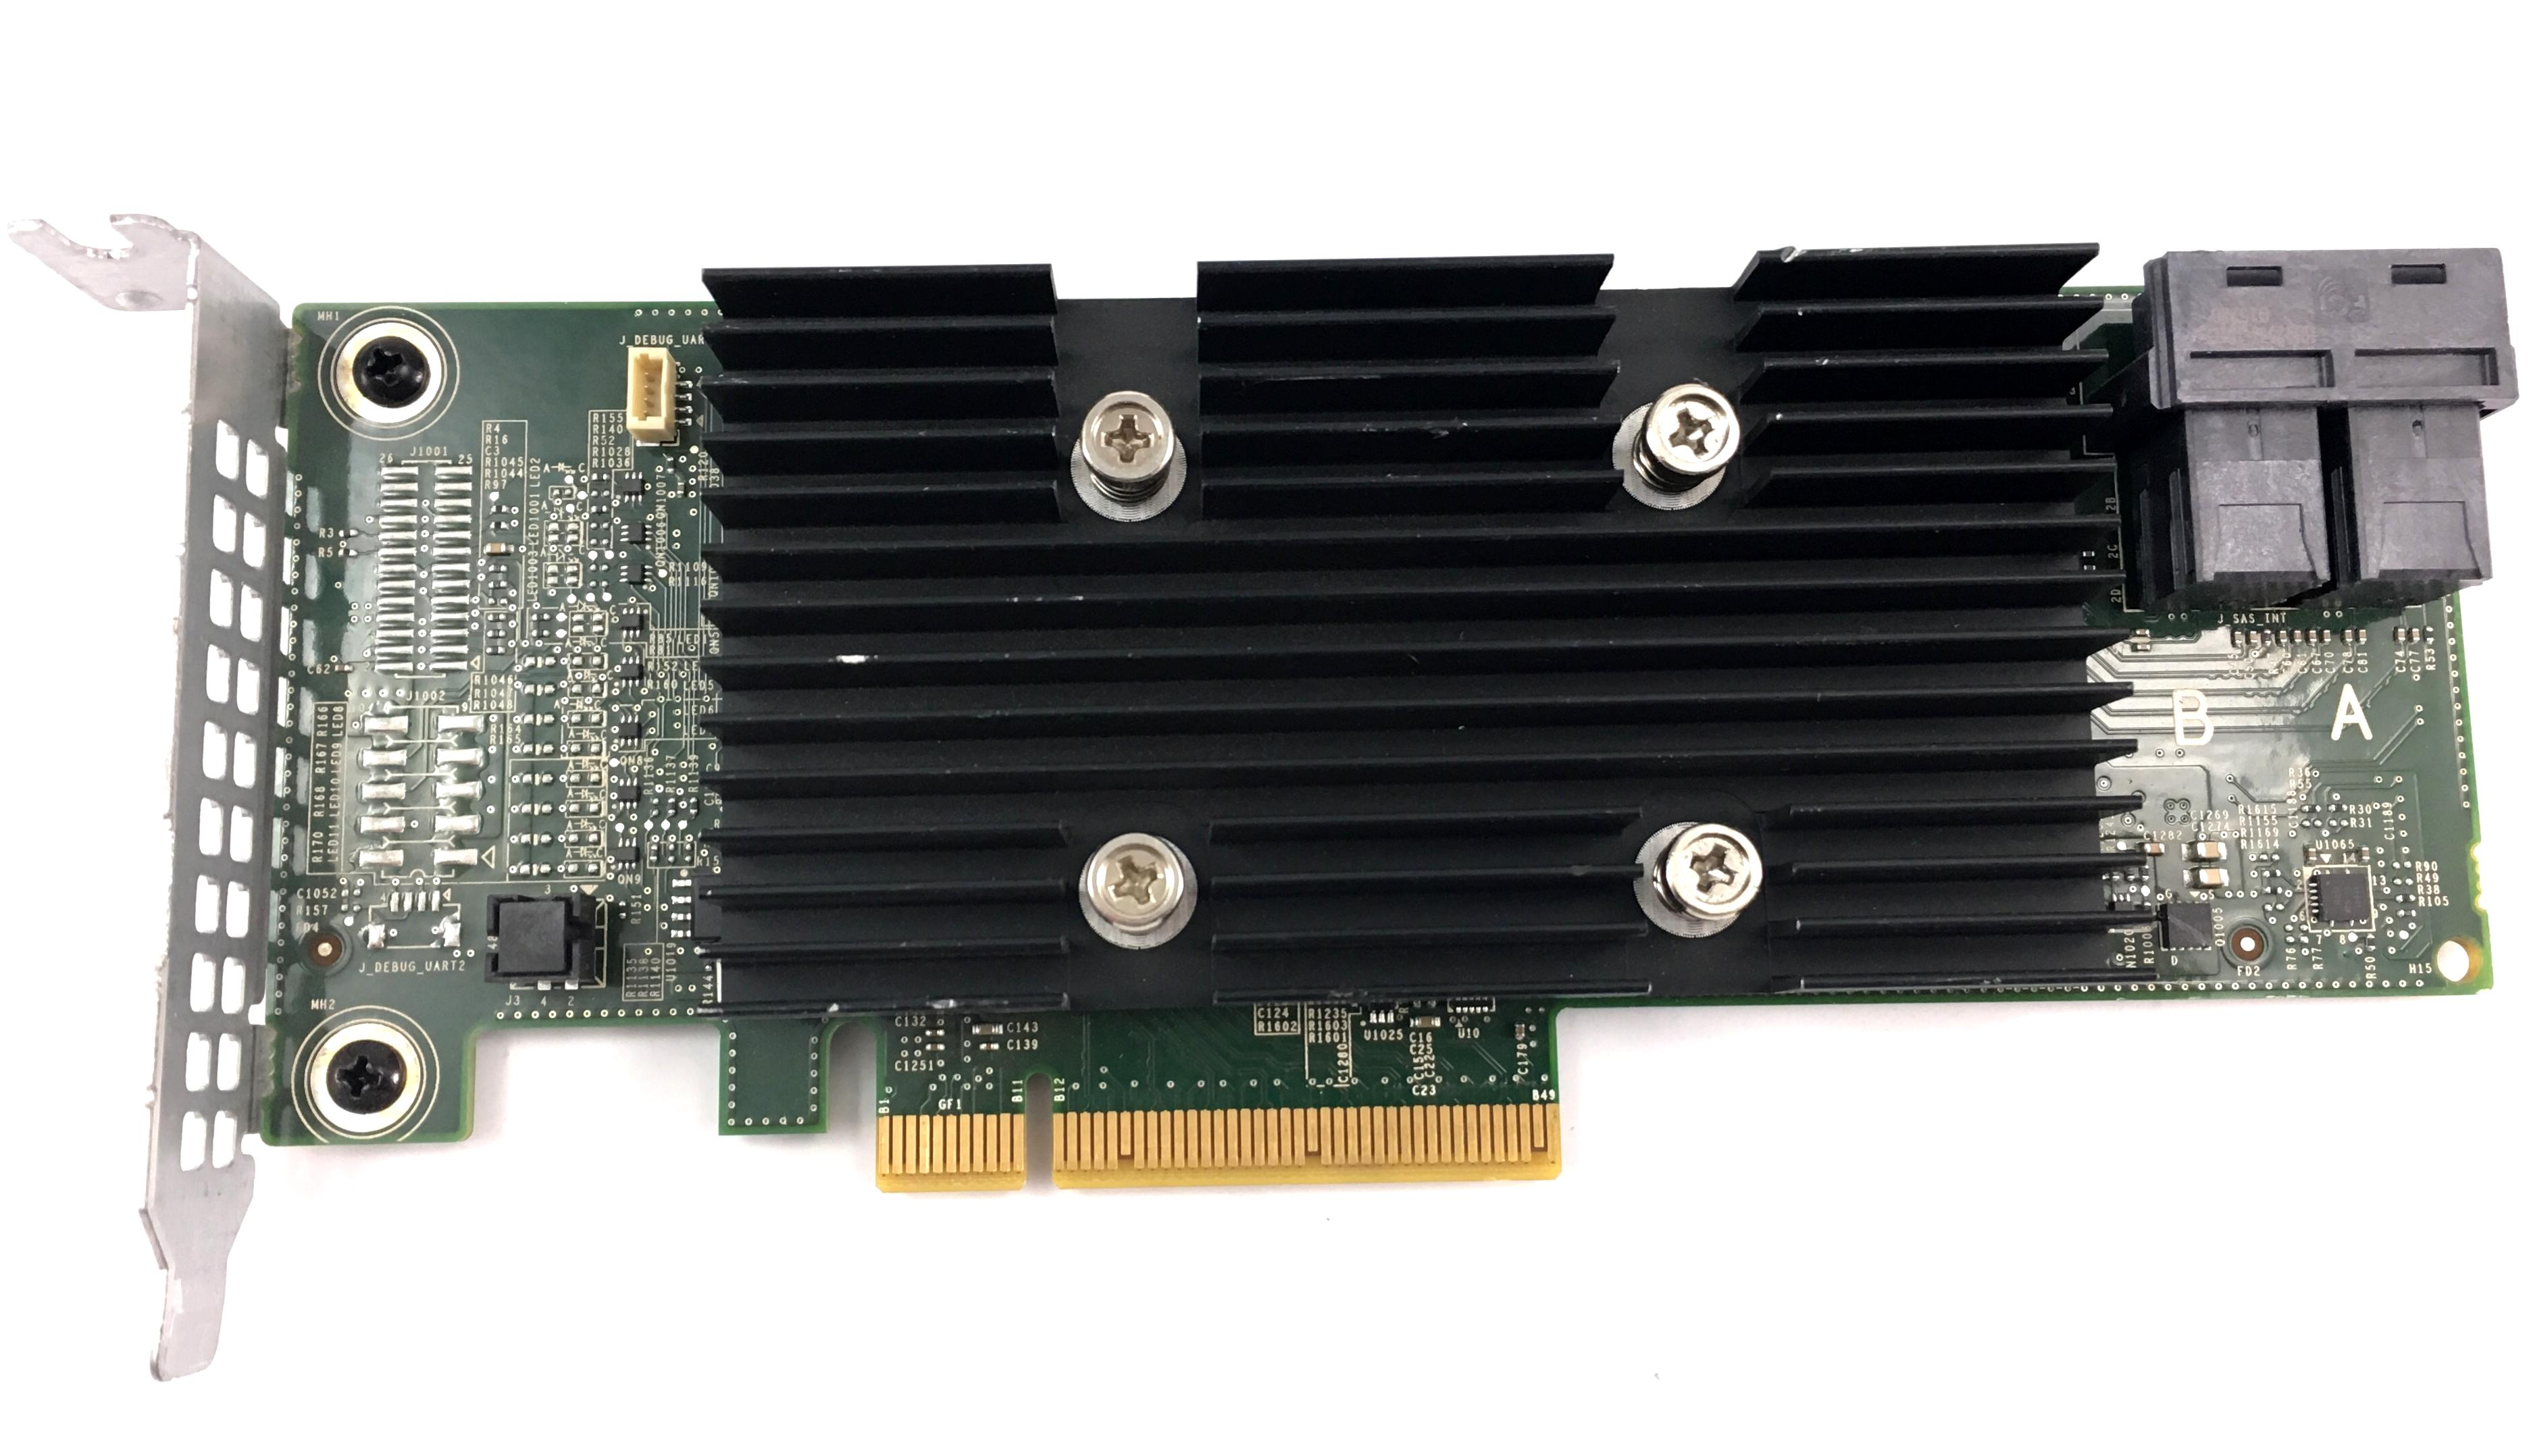 TCKPF Dell PERC H330 PCI-E X8 12Gbps Raid Controller Card (TCKPF)